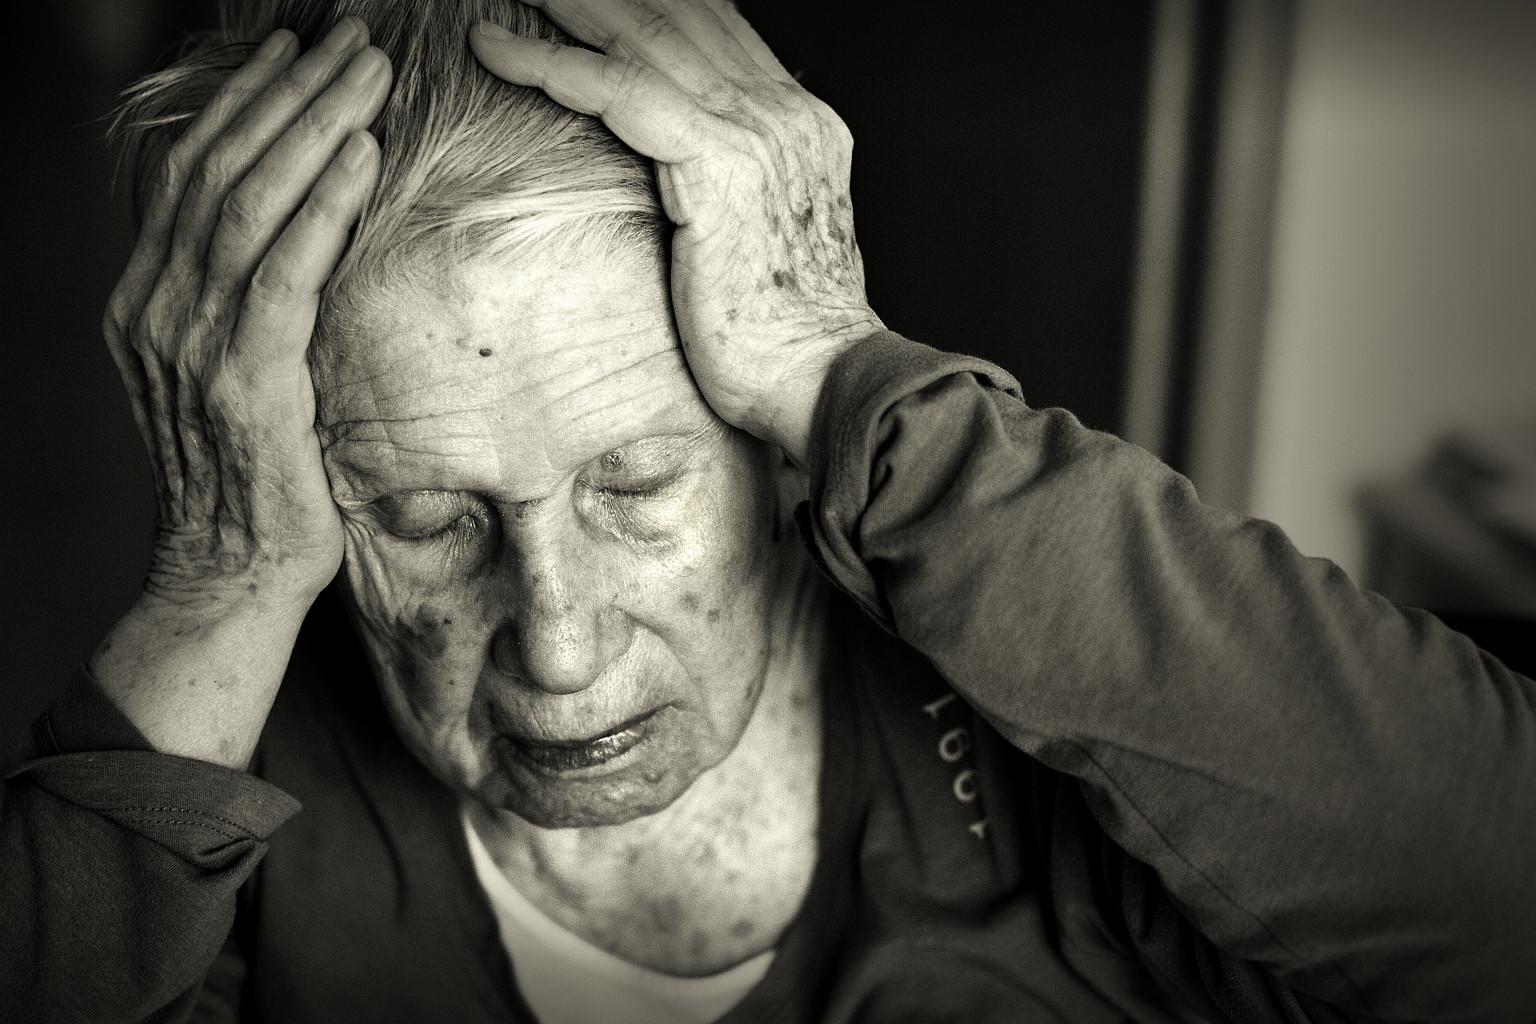 Alzheimer contrastato da antidolorifico